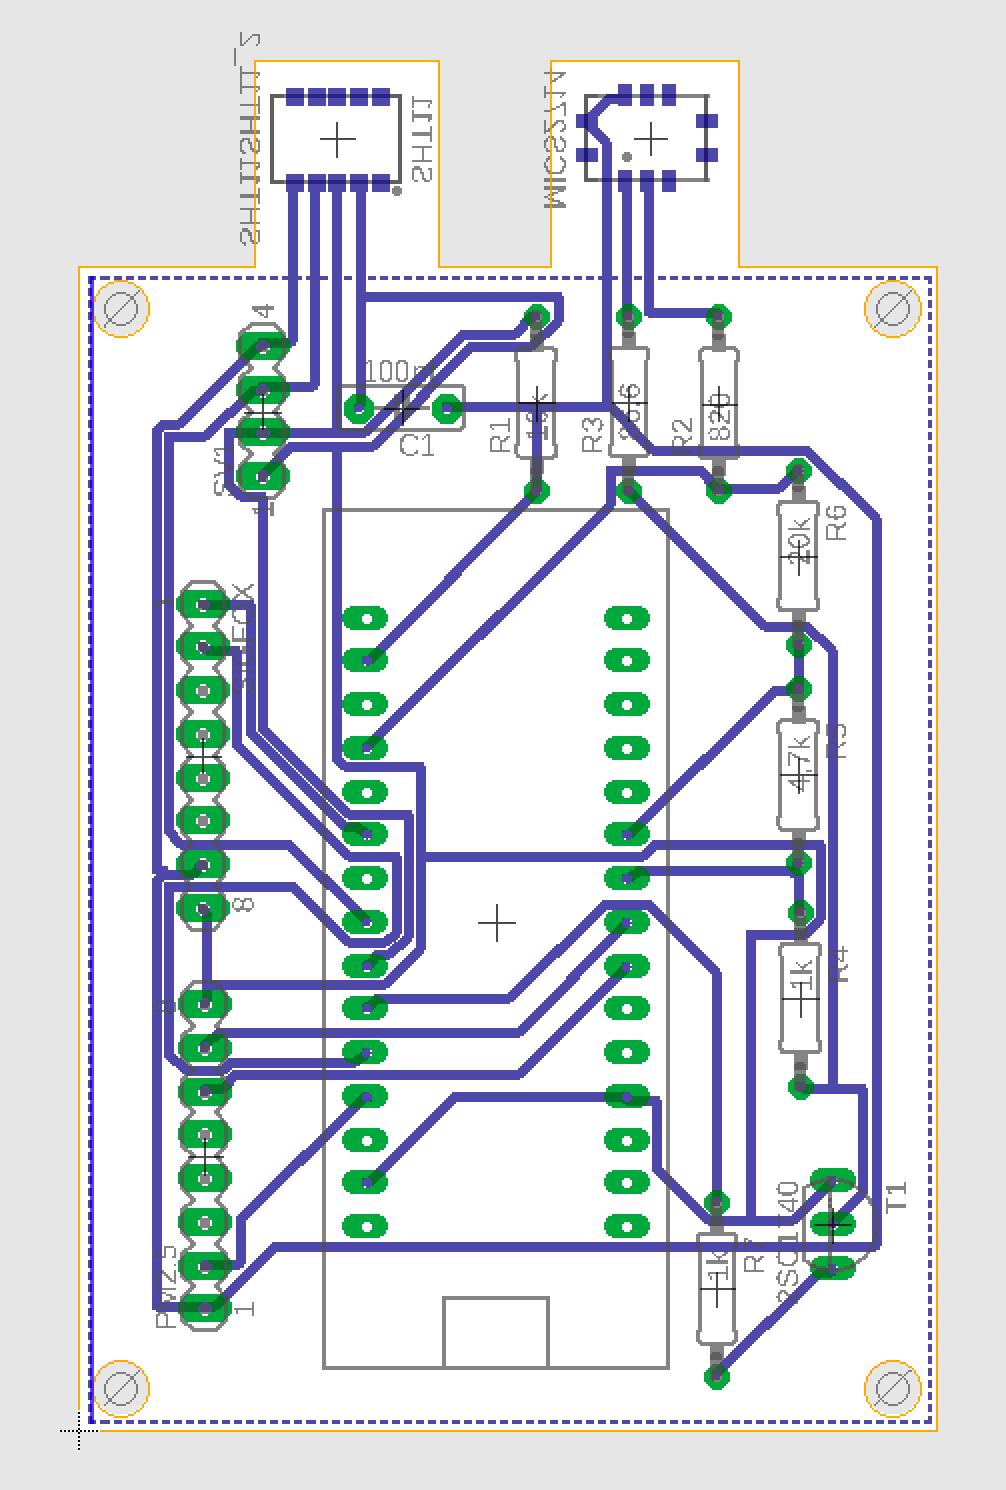 Hardware - PCB